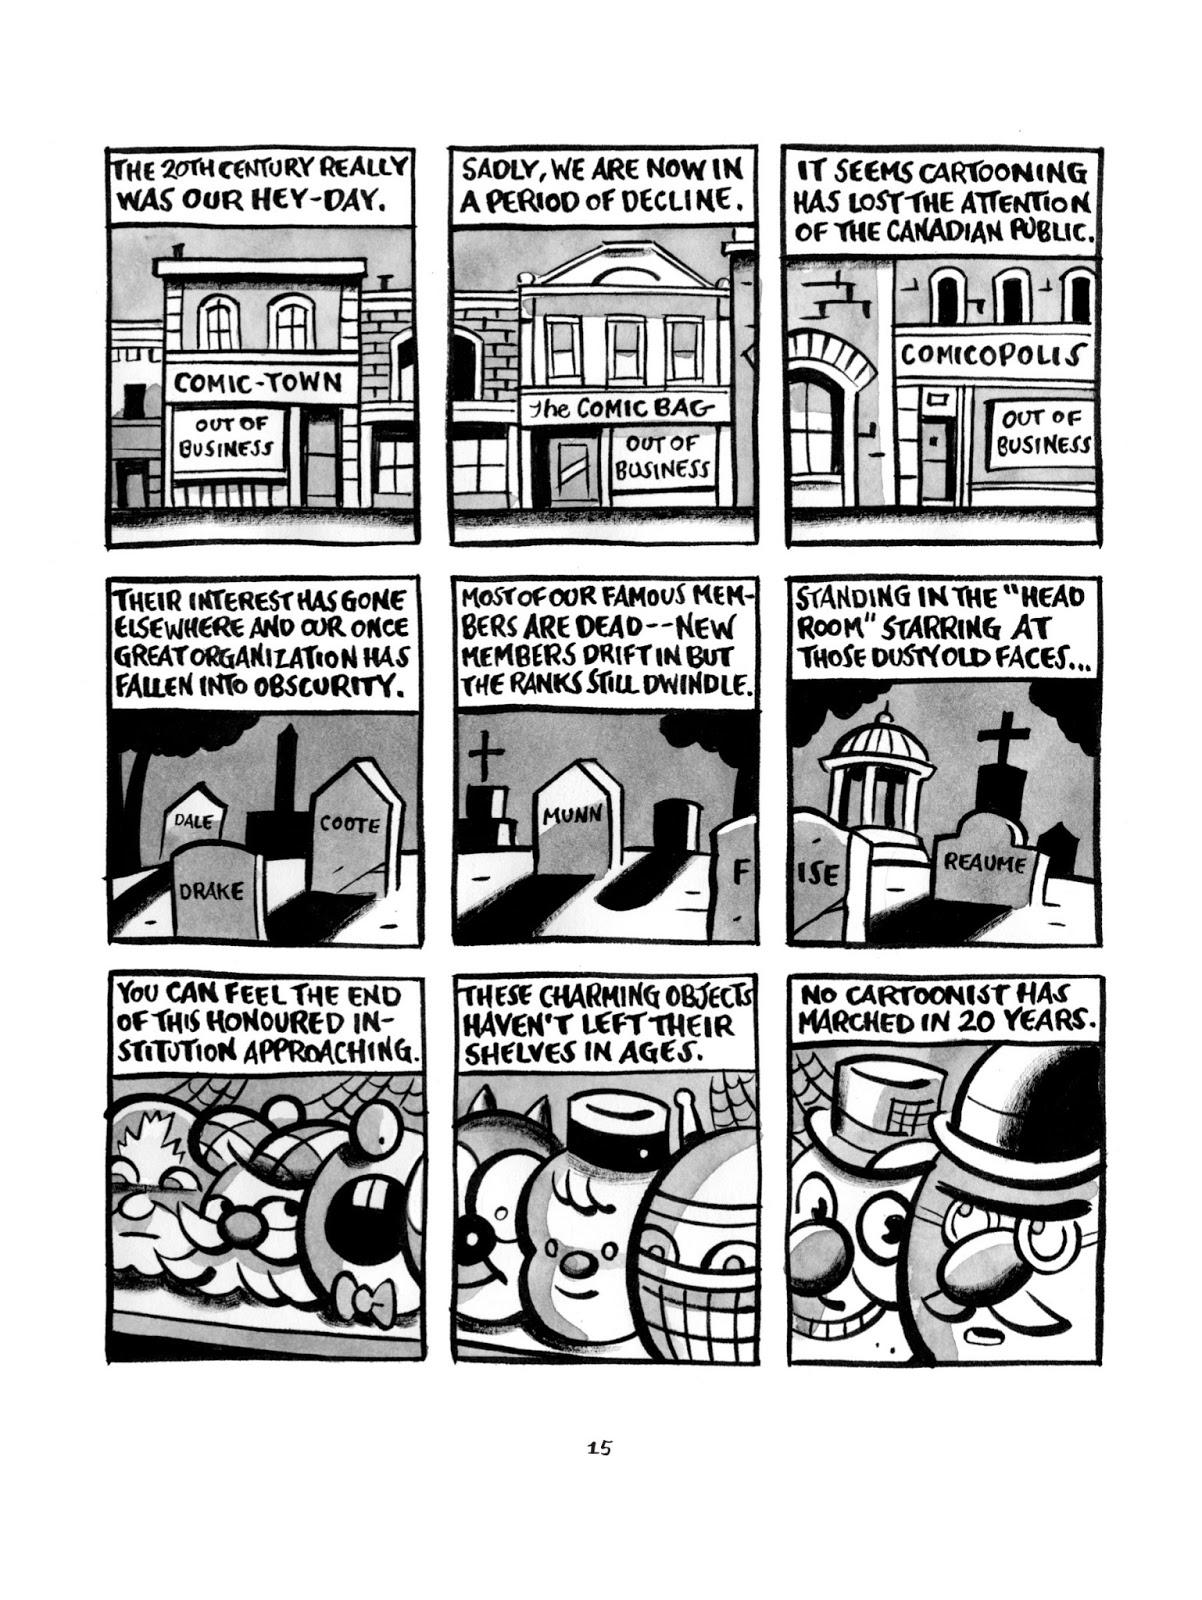 [Comics] ¿Qué leer fuera del Mainstream? - Página 5 Fullpage-Seth